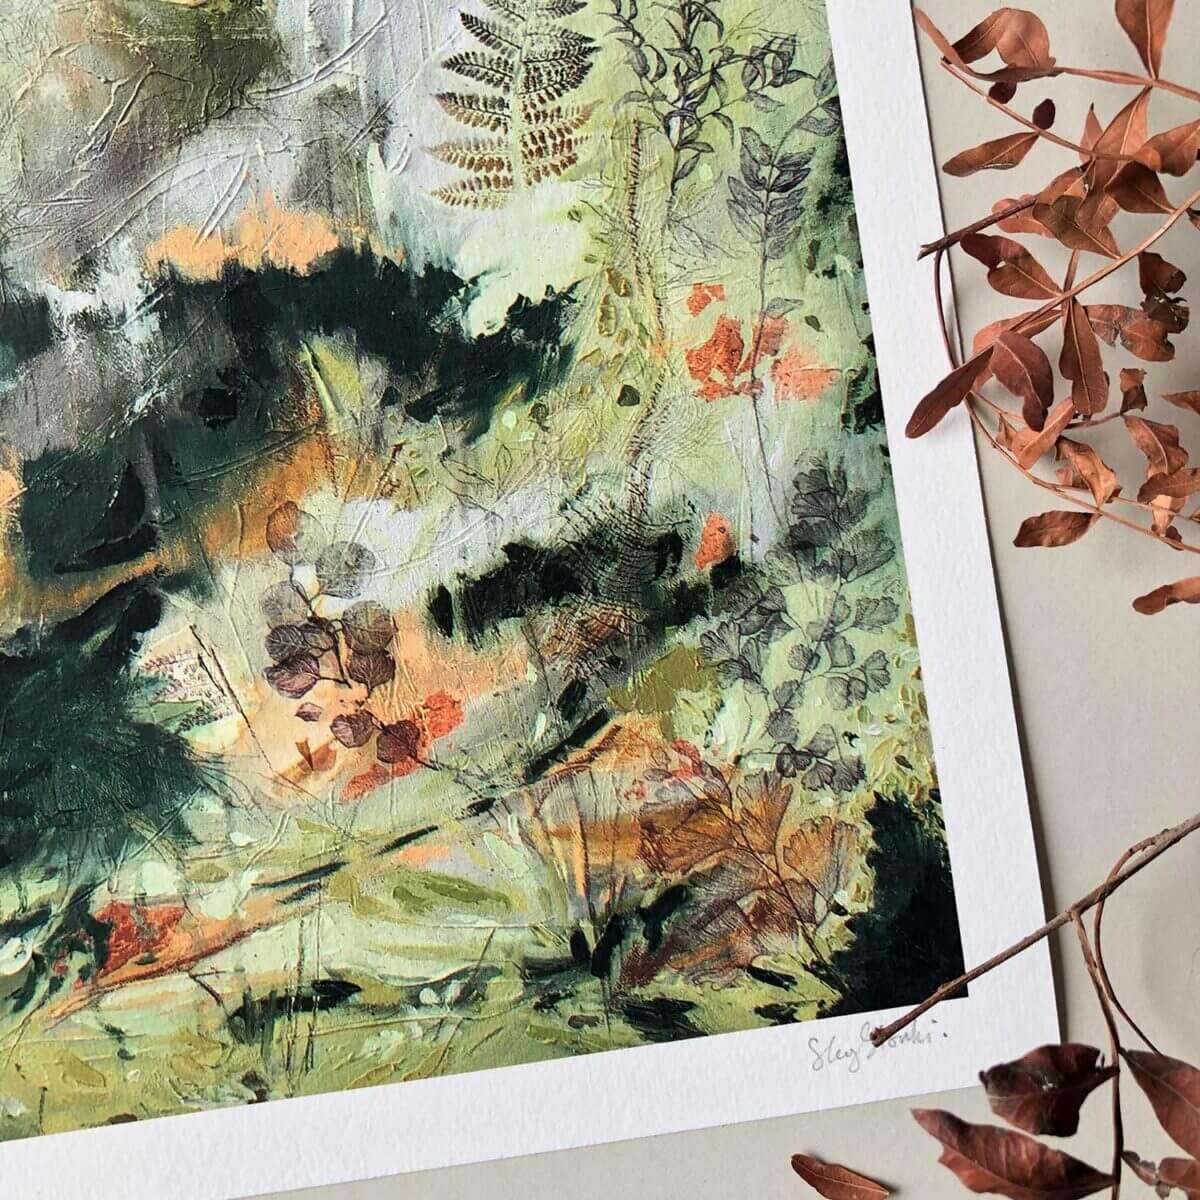 Hope-Print-Plants-Sky-Siouki